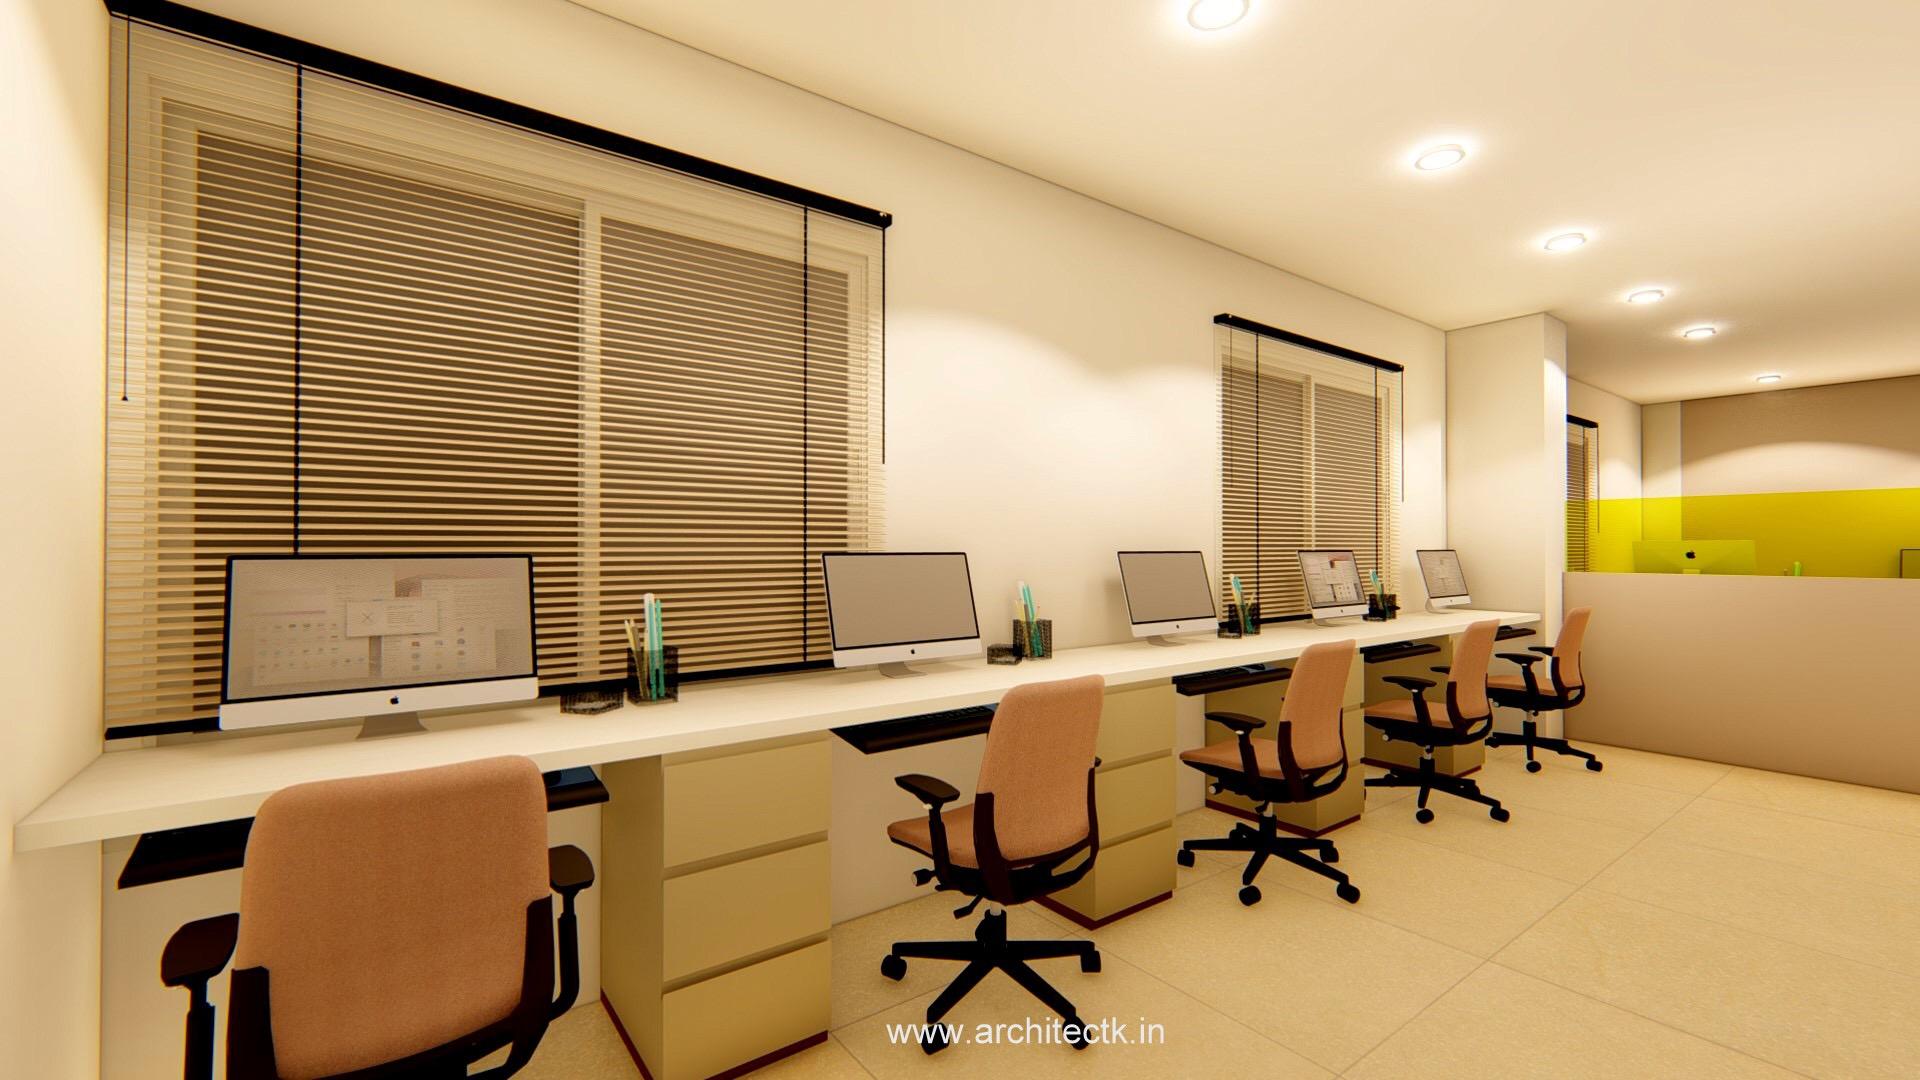 OFFICE, WORKSTATION